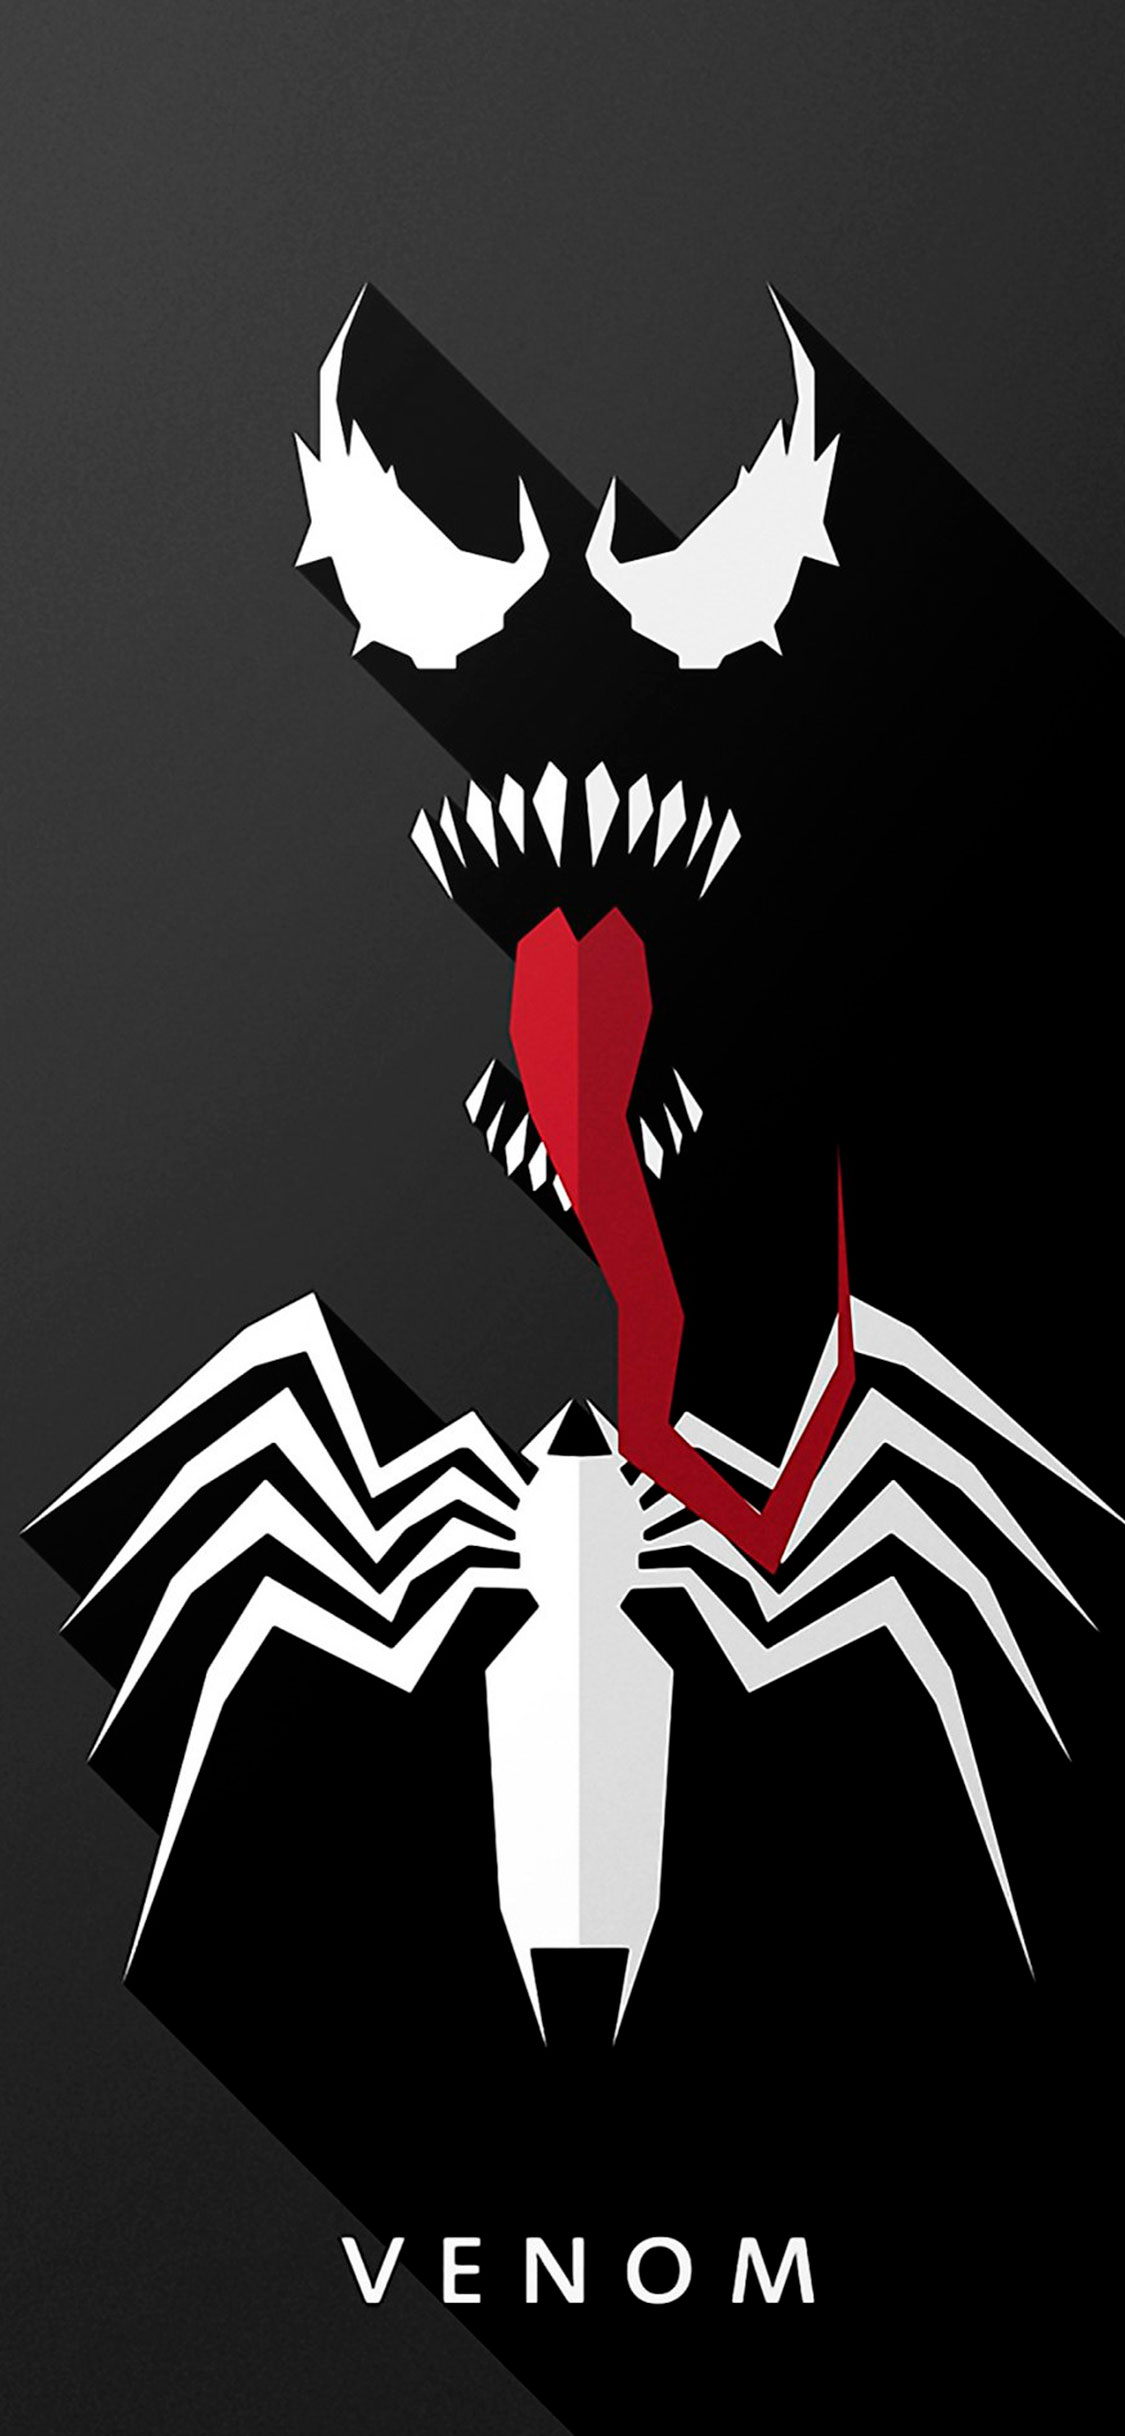 iPhone wallpaper venom3 Venom